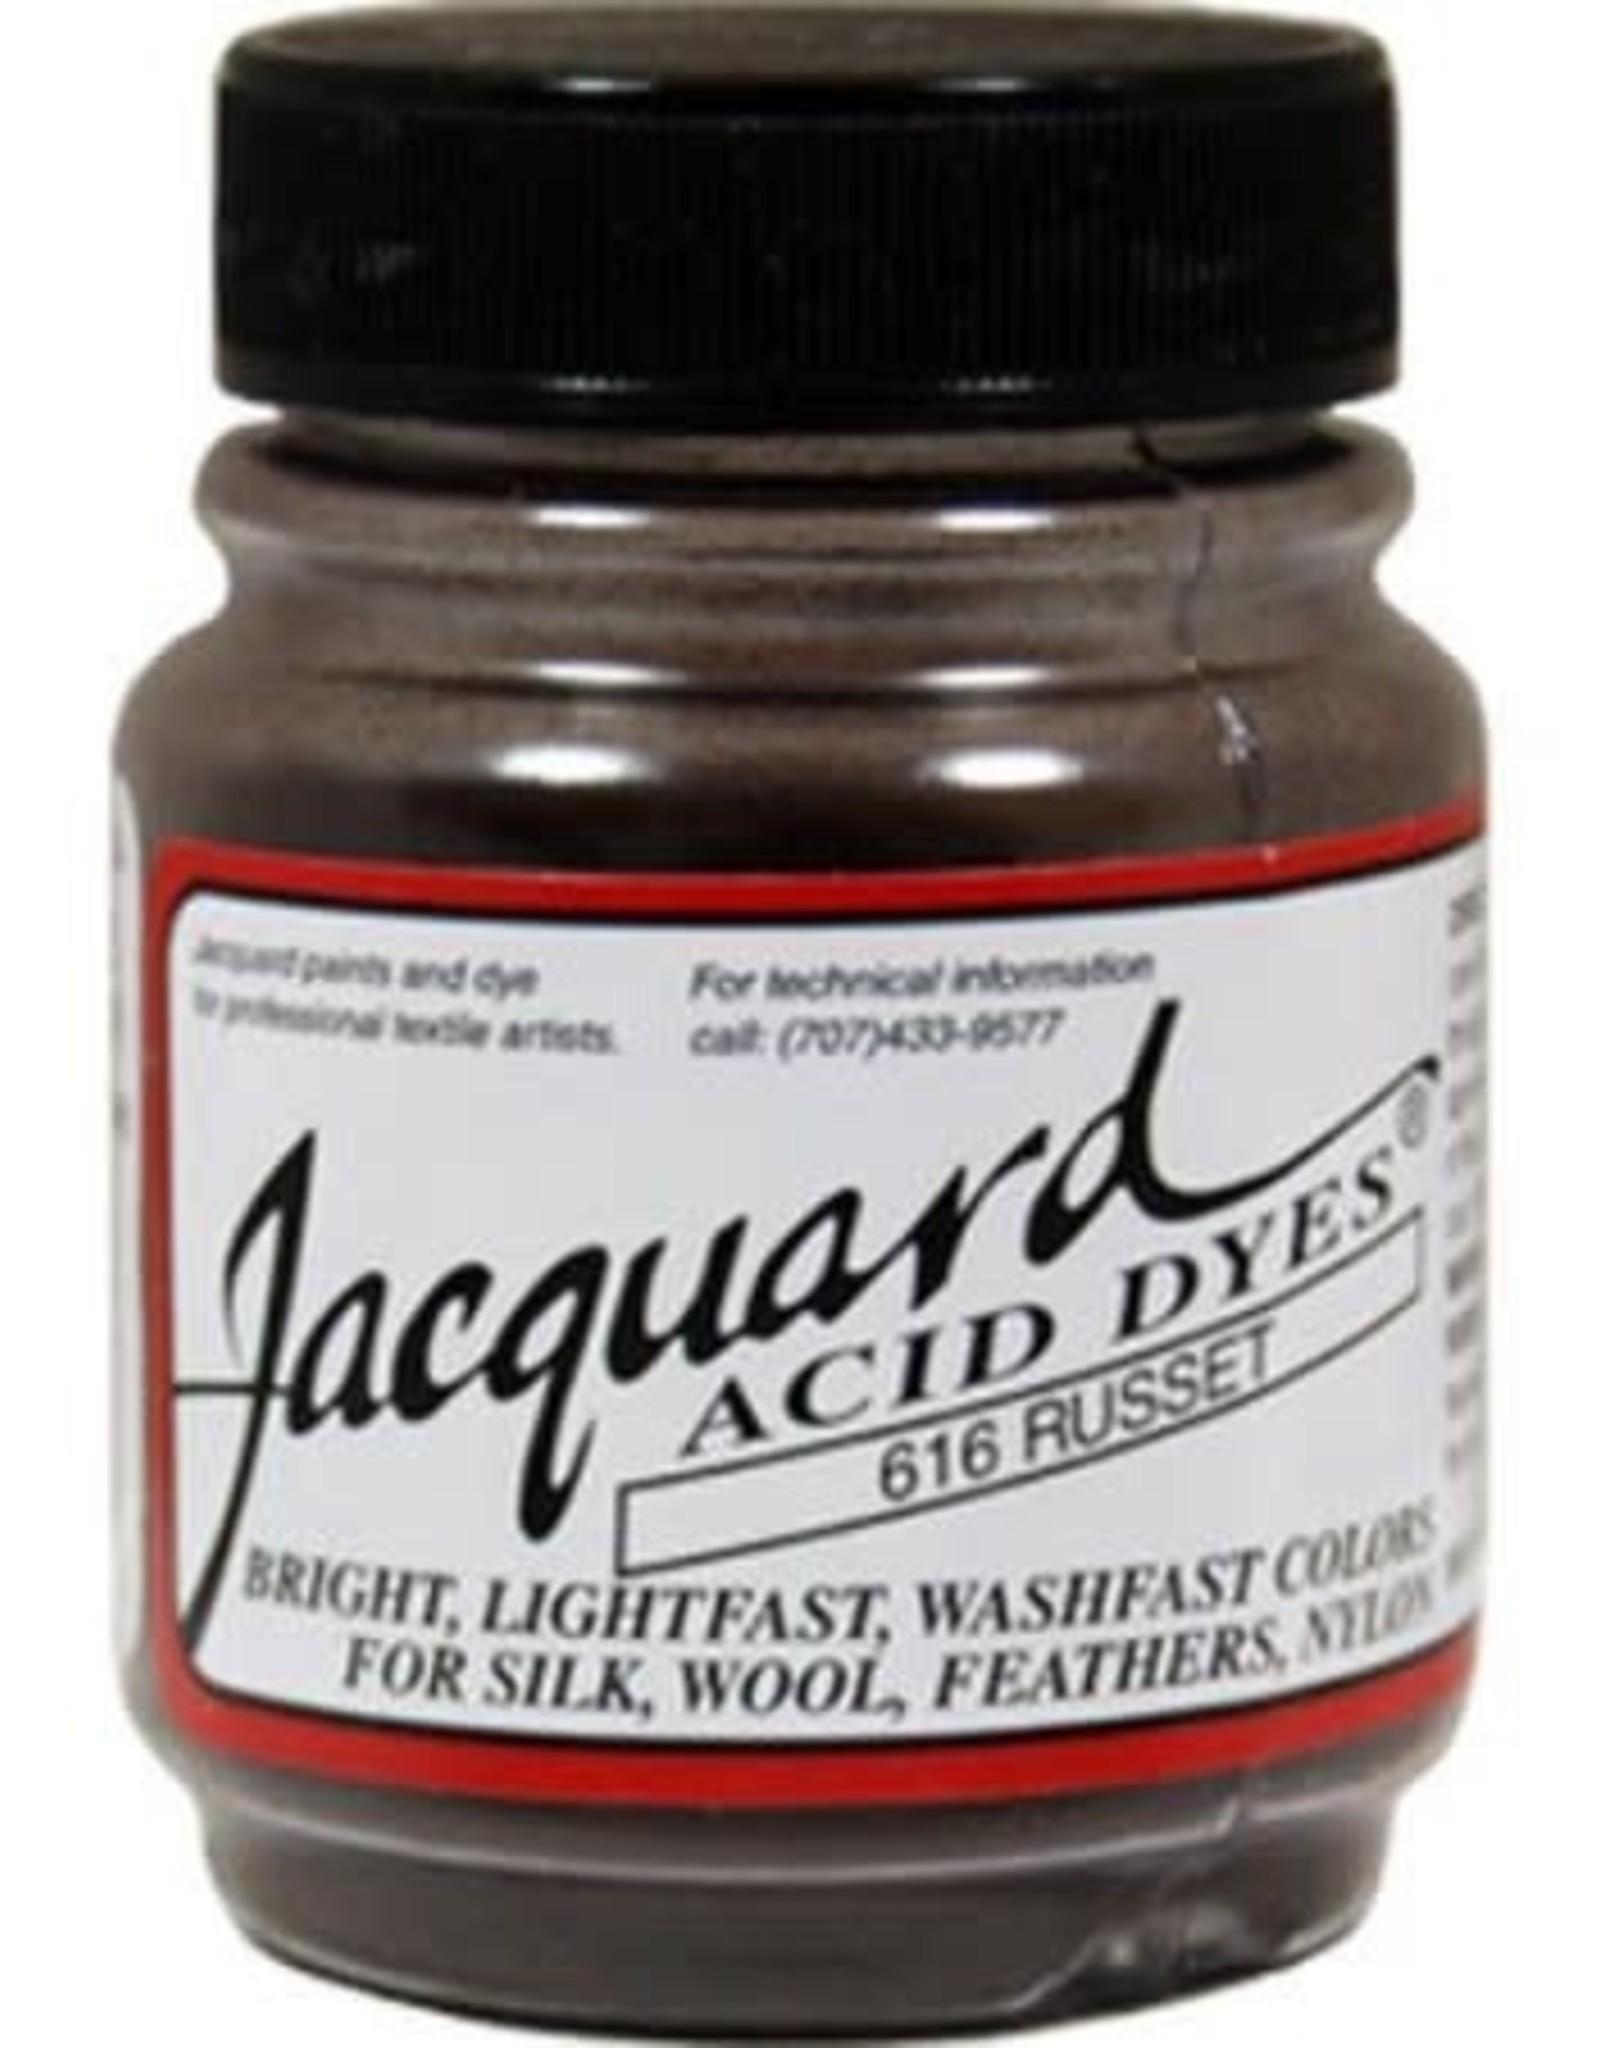 Jacquard Jacquard Acid Dye Russet